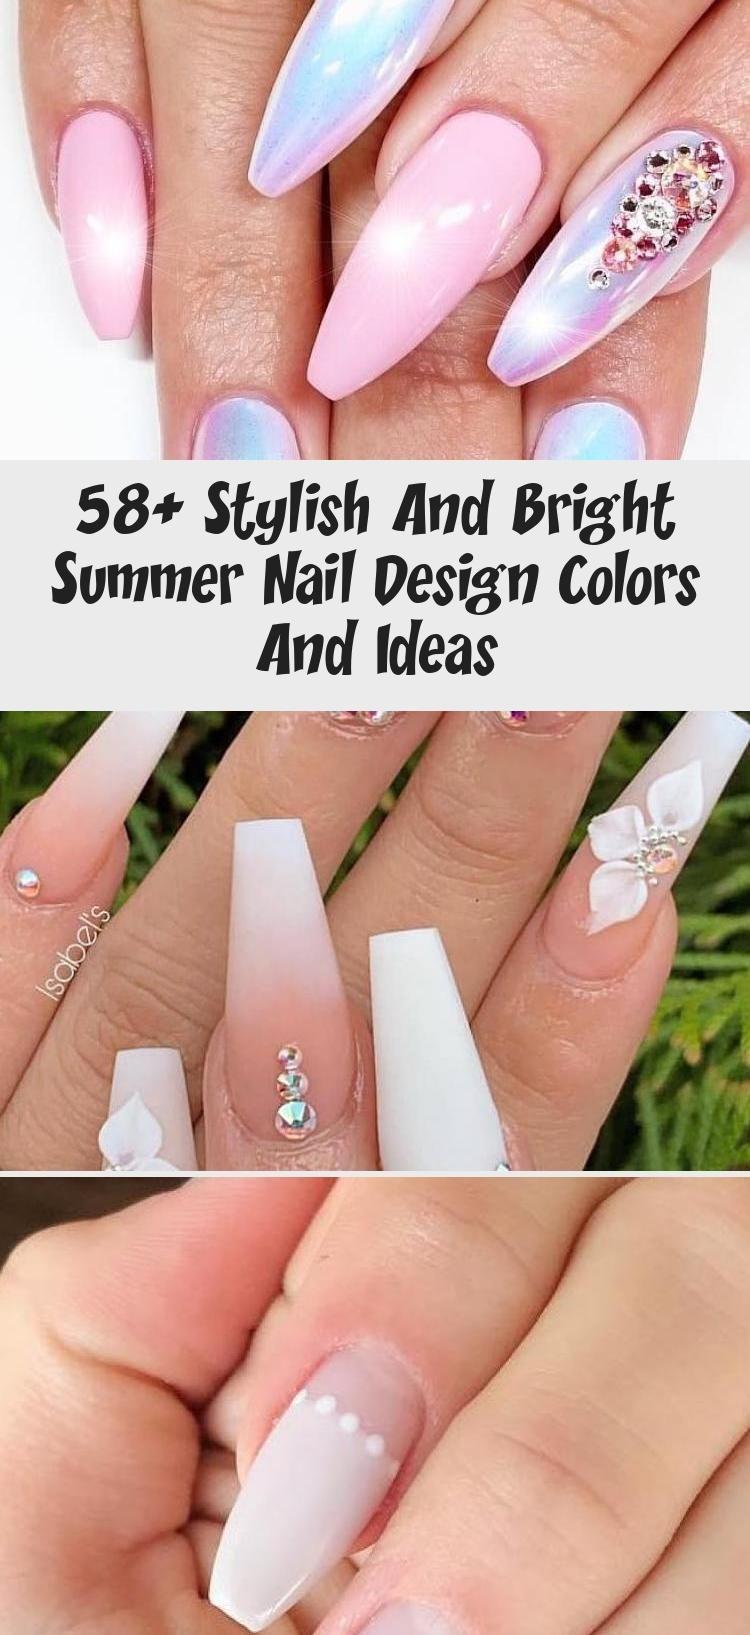 58+ Stylish And Bright Summer Nail Design Colors And Ideas – Nail